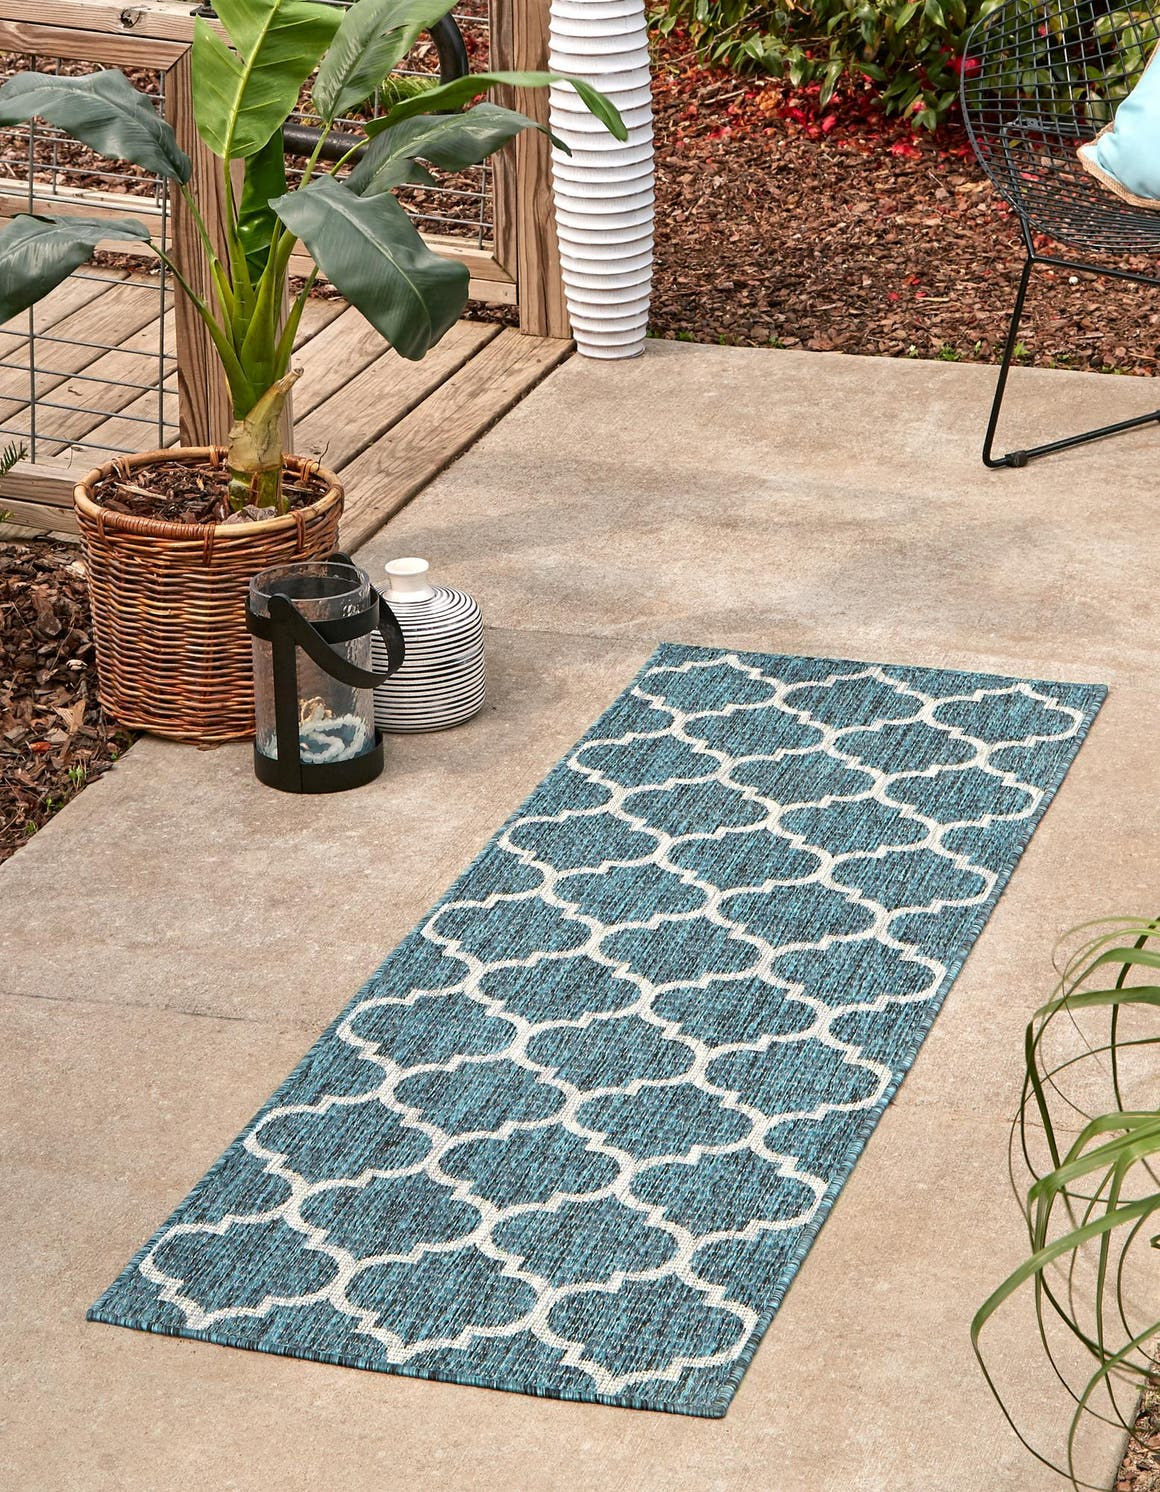 2' x 8' Outdoor Trellis Runner Rug main image